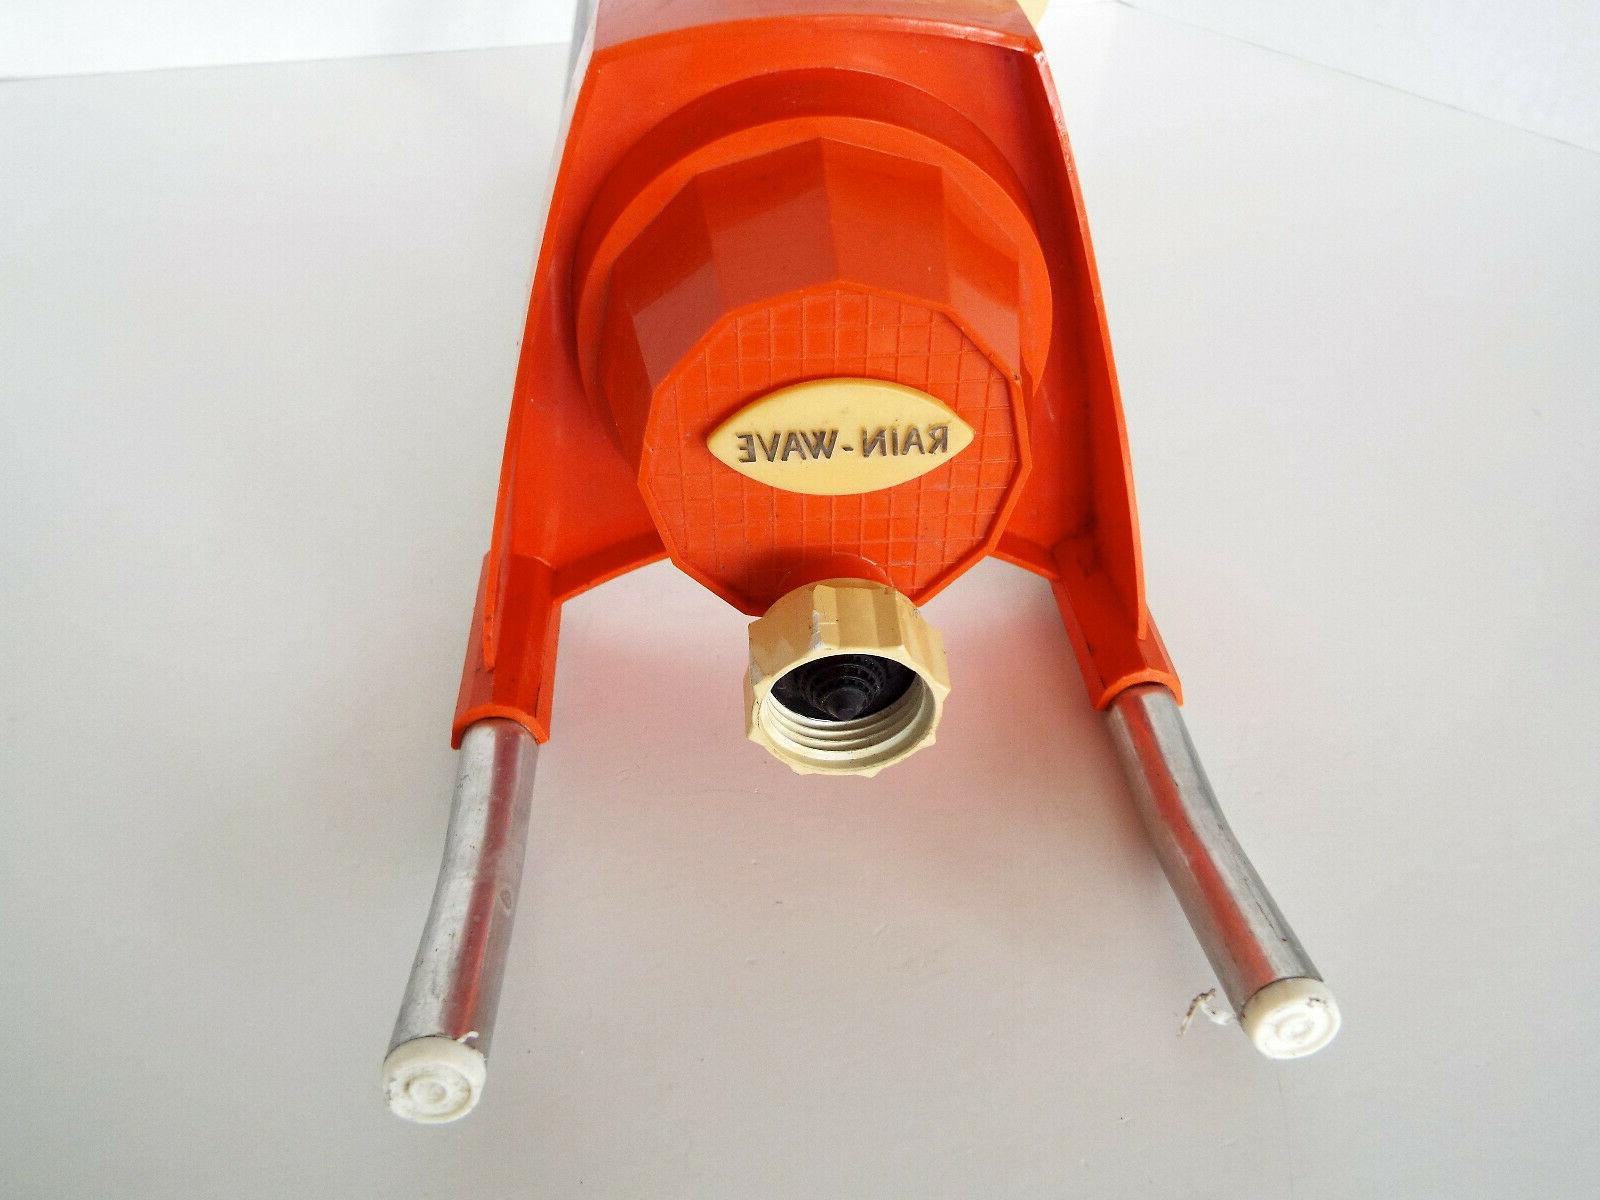 Vintage Rain Wave Sprinkler Oscillating Spray Orange